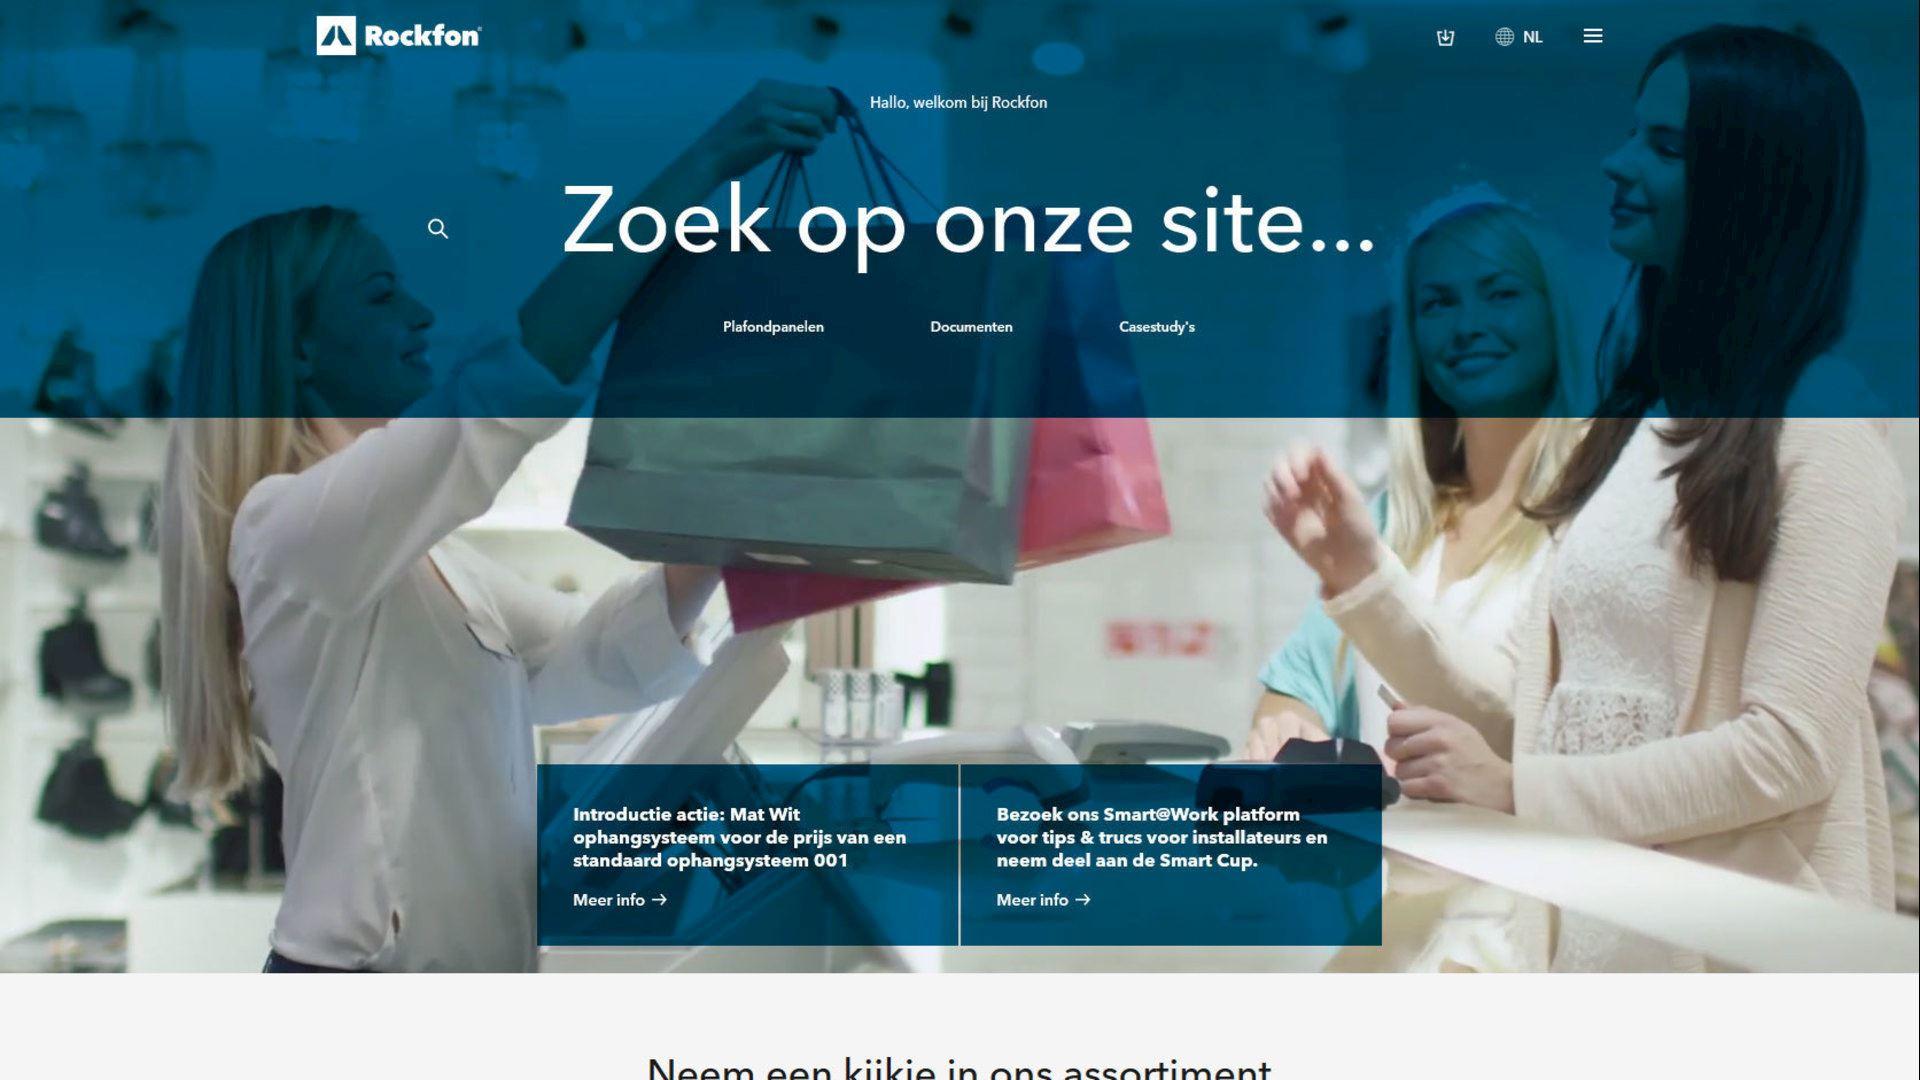 web guide page illustration, screen shot, FR